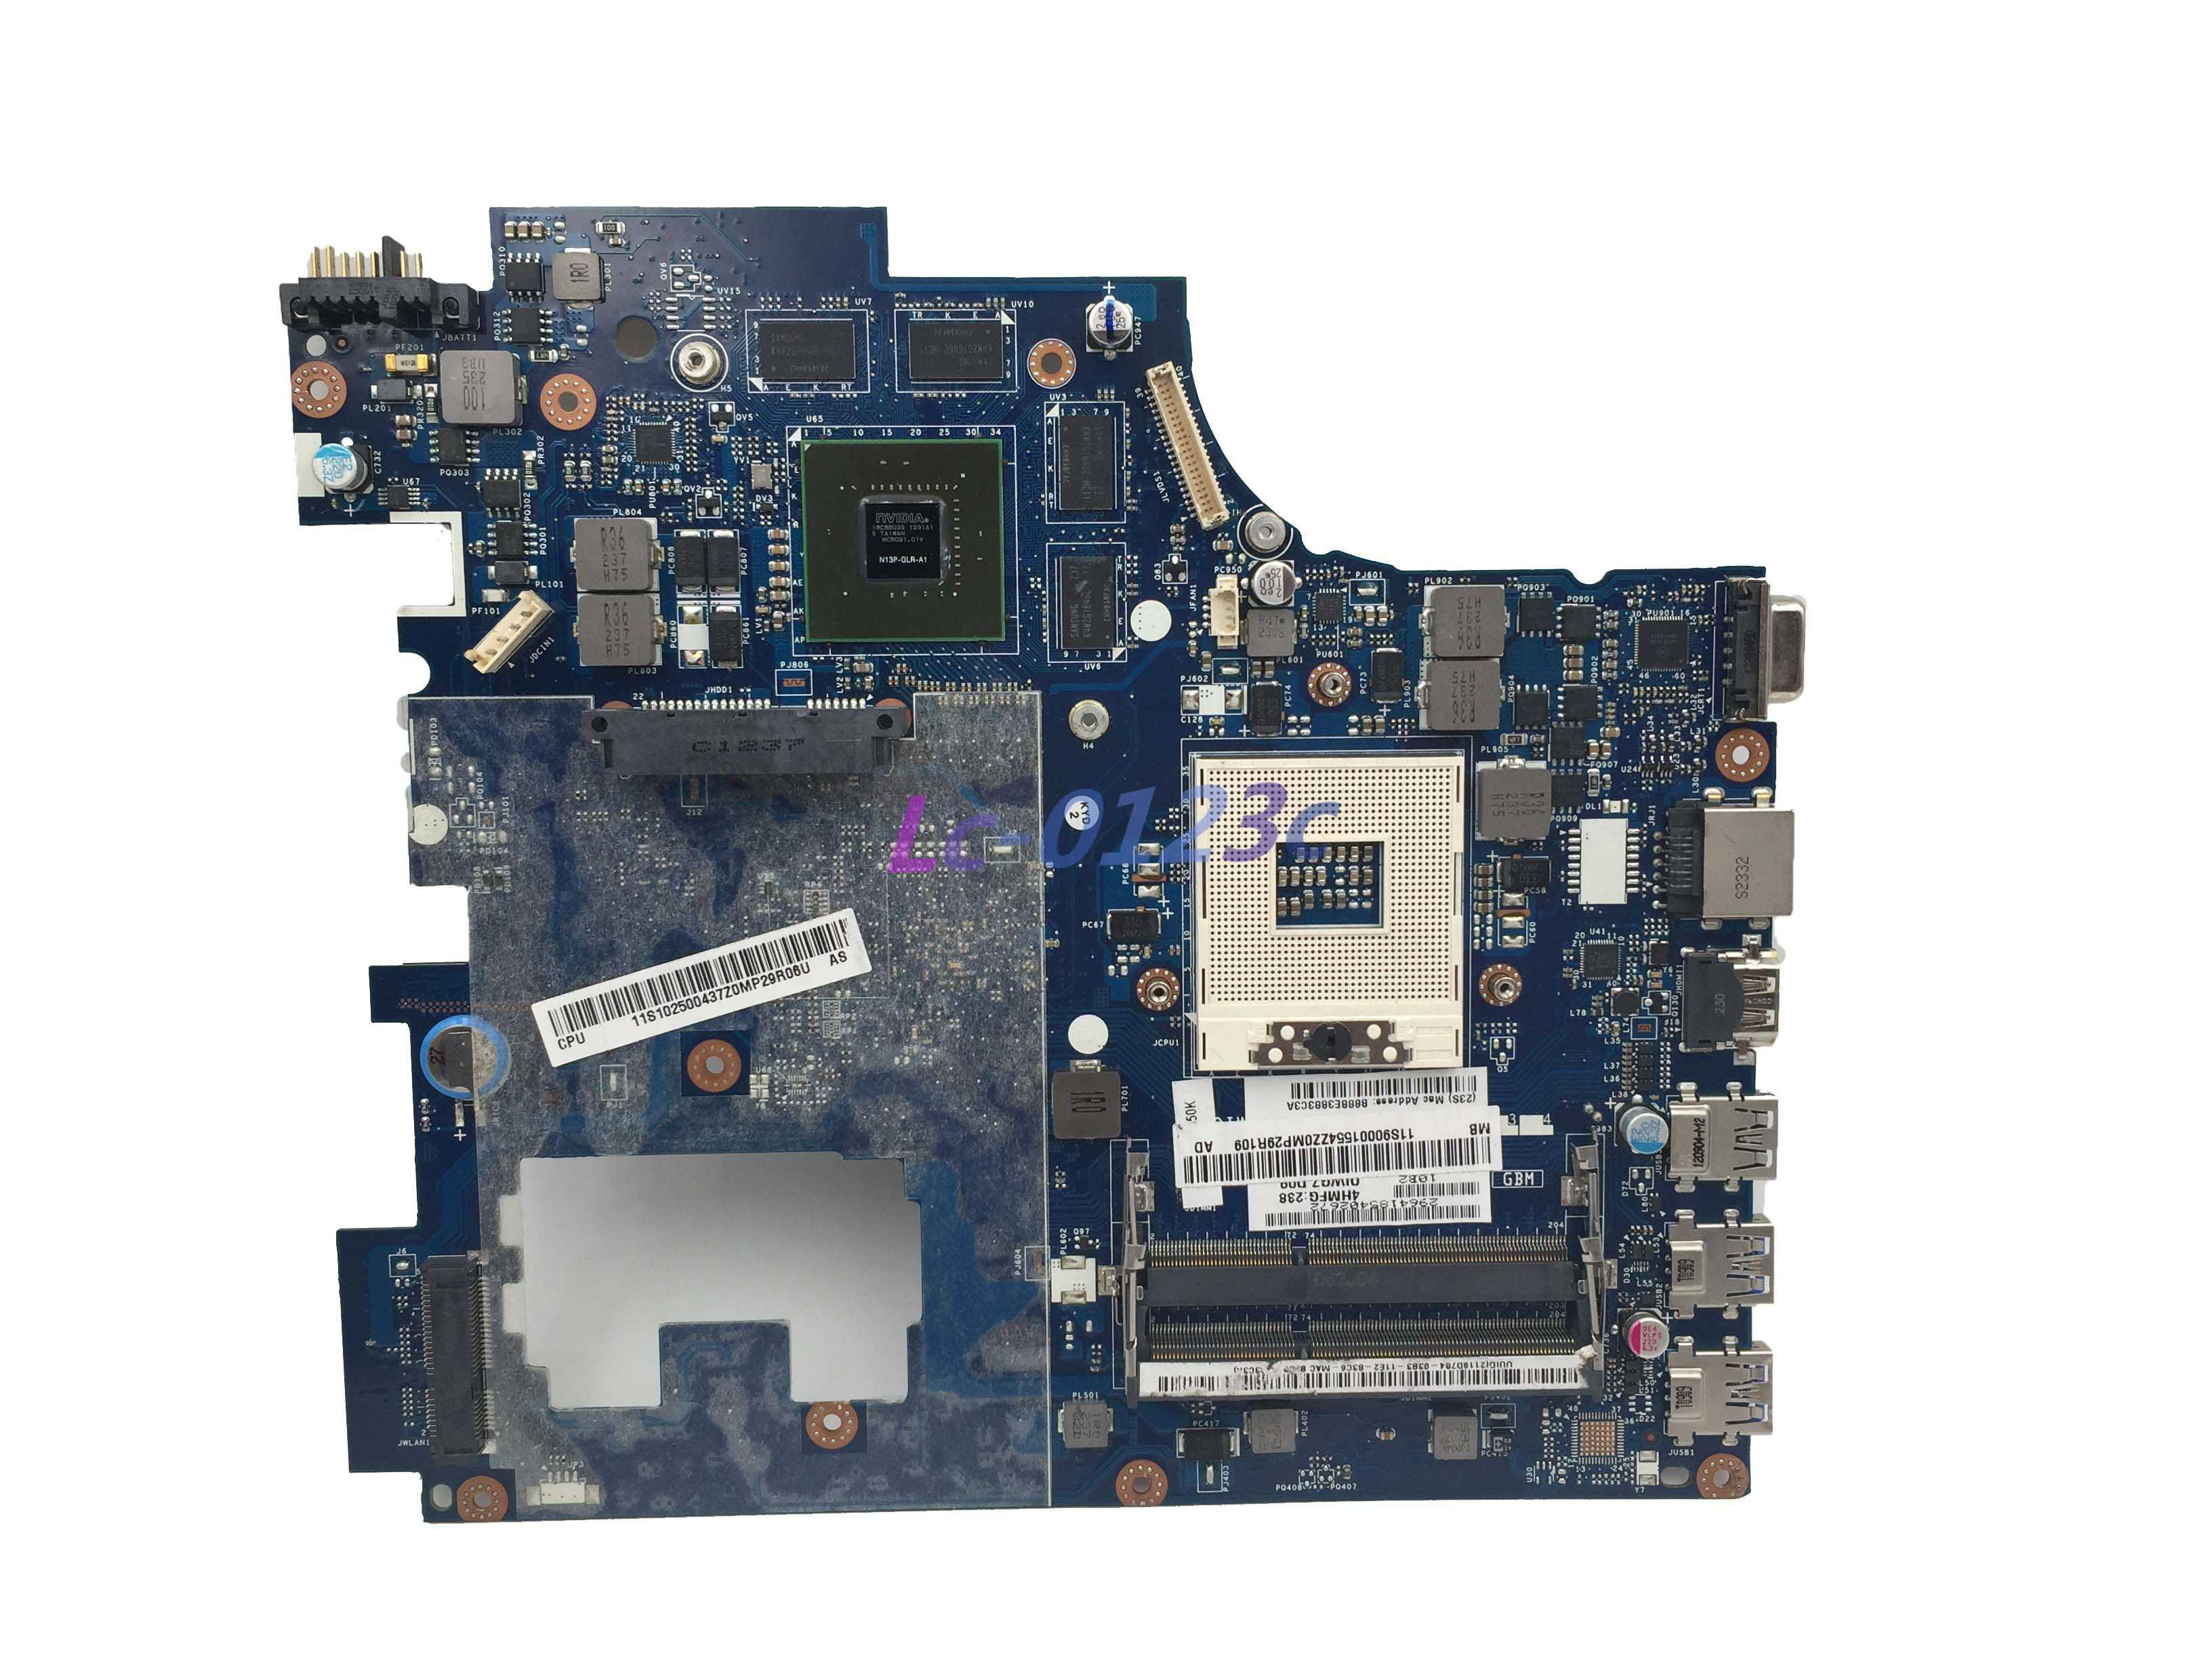 FULCOL For Lenovo G780 Laptop motherboard 90001554 HM76 GT635M 2 GB GPU QIWG7 LA-7983P DDR3